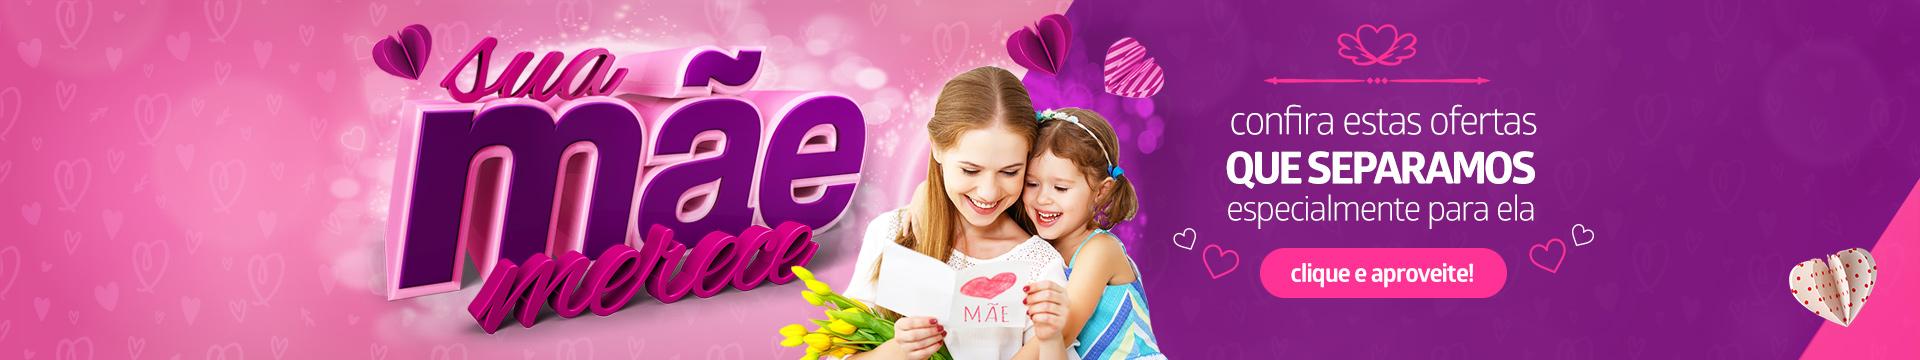 Dia das Mães - Capa